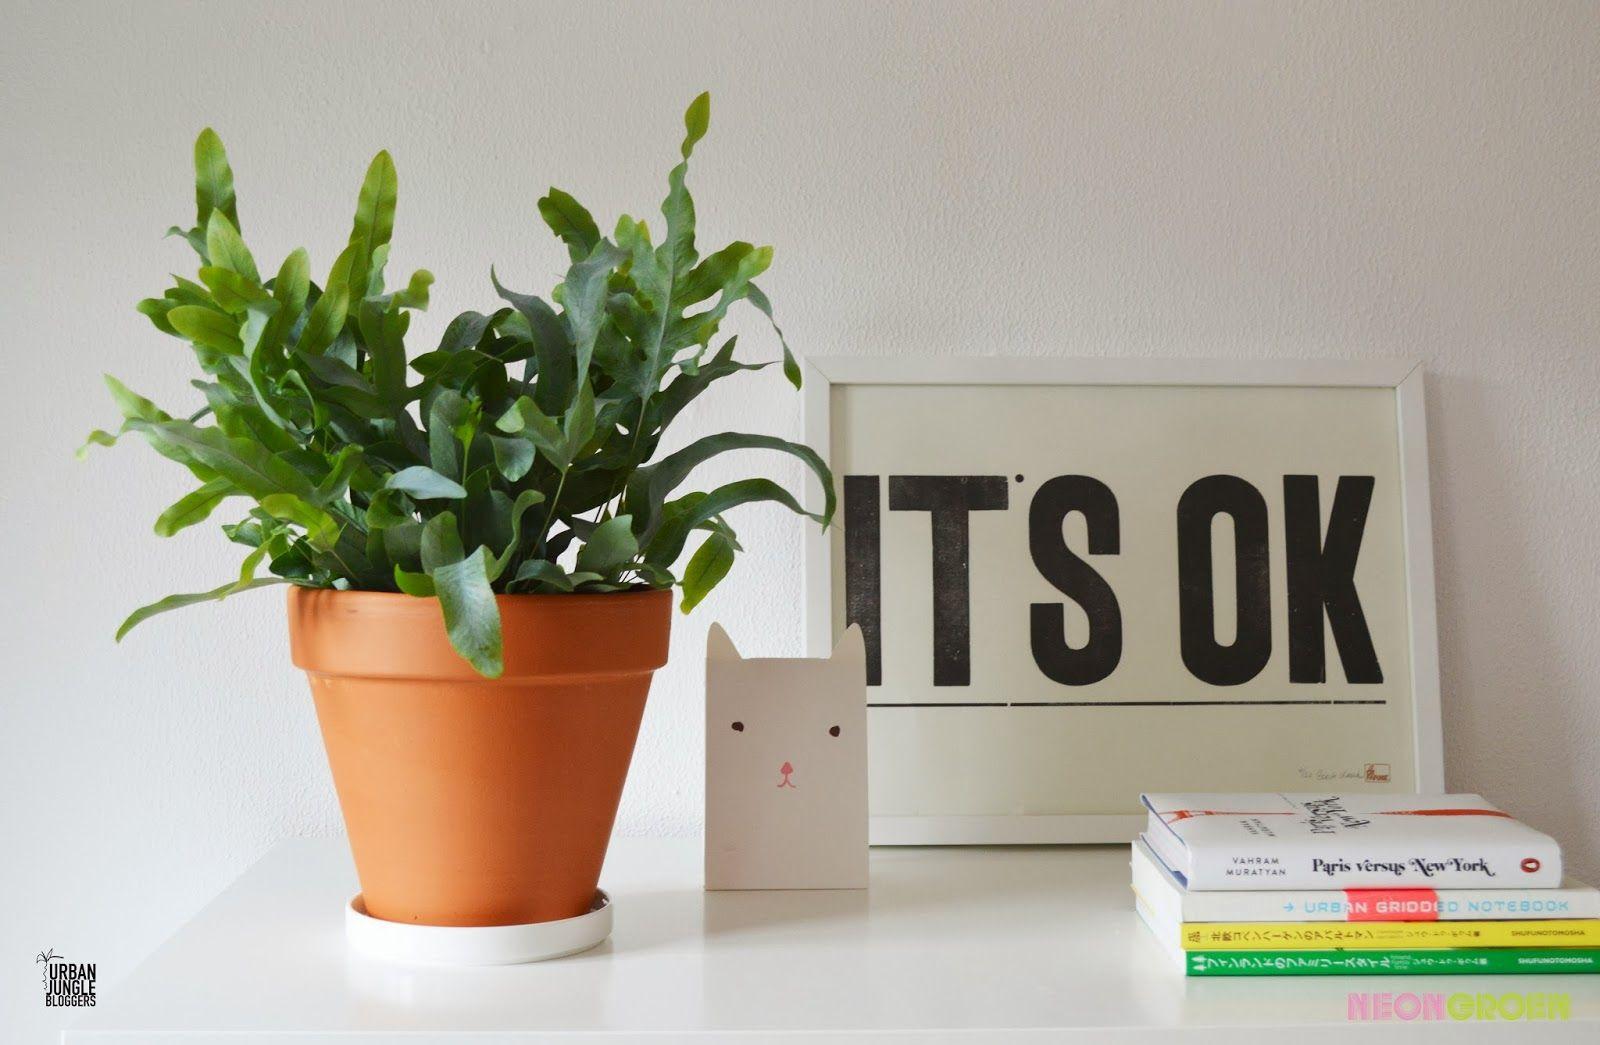 NeongroeN: Urban Jungle Bloggers 1 Plant - 3 Stylings